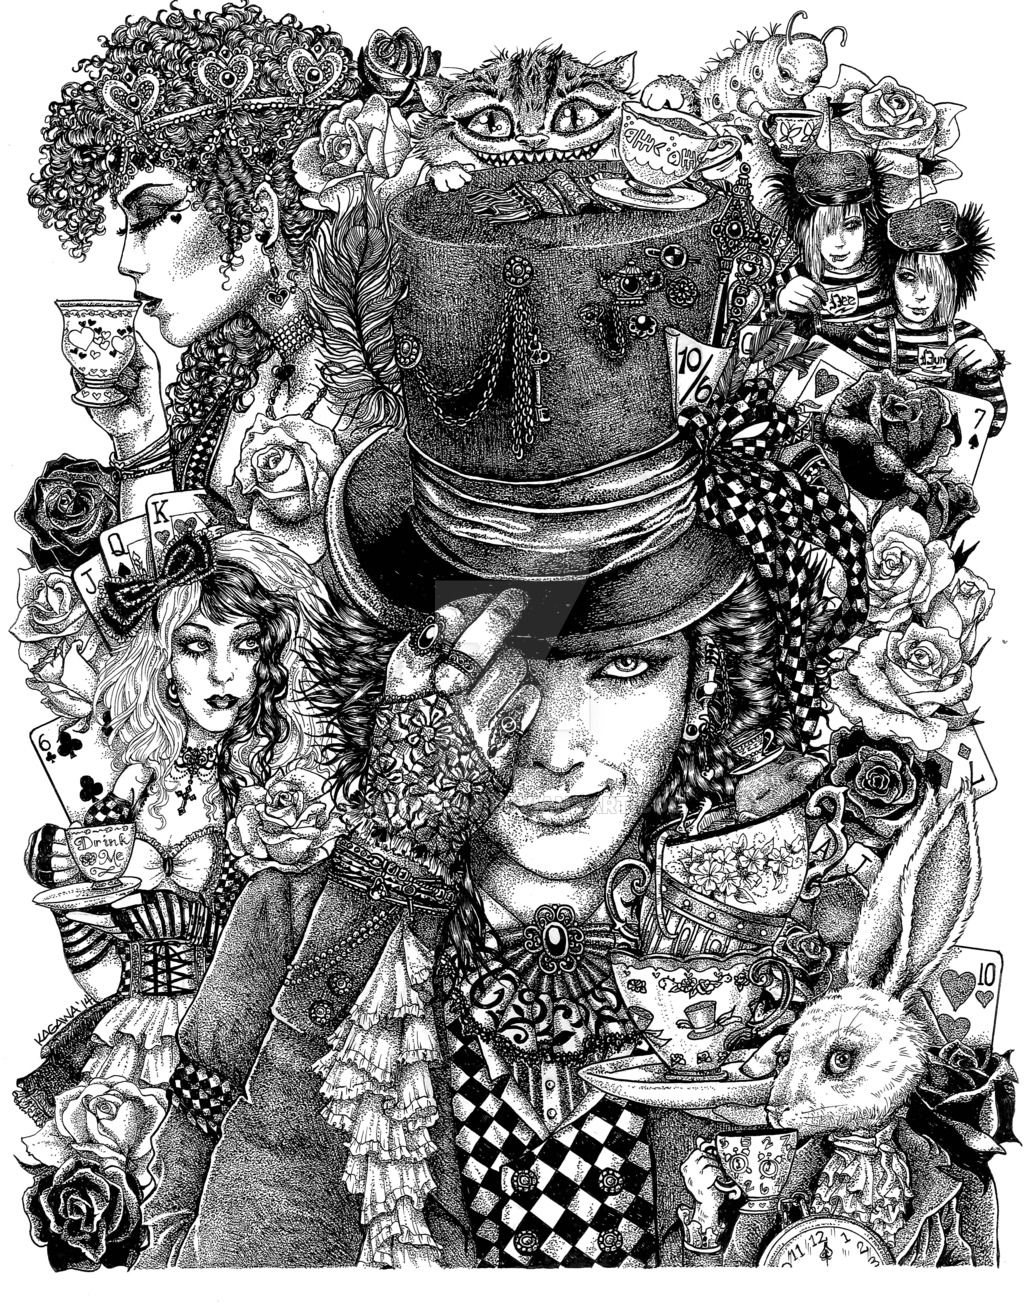 Hatter's Tea Party by LKBurke29.deviantart.com on @DeviantArt